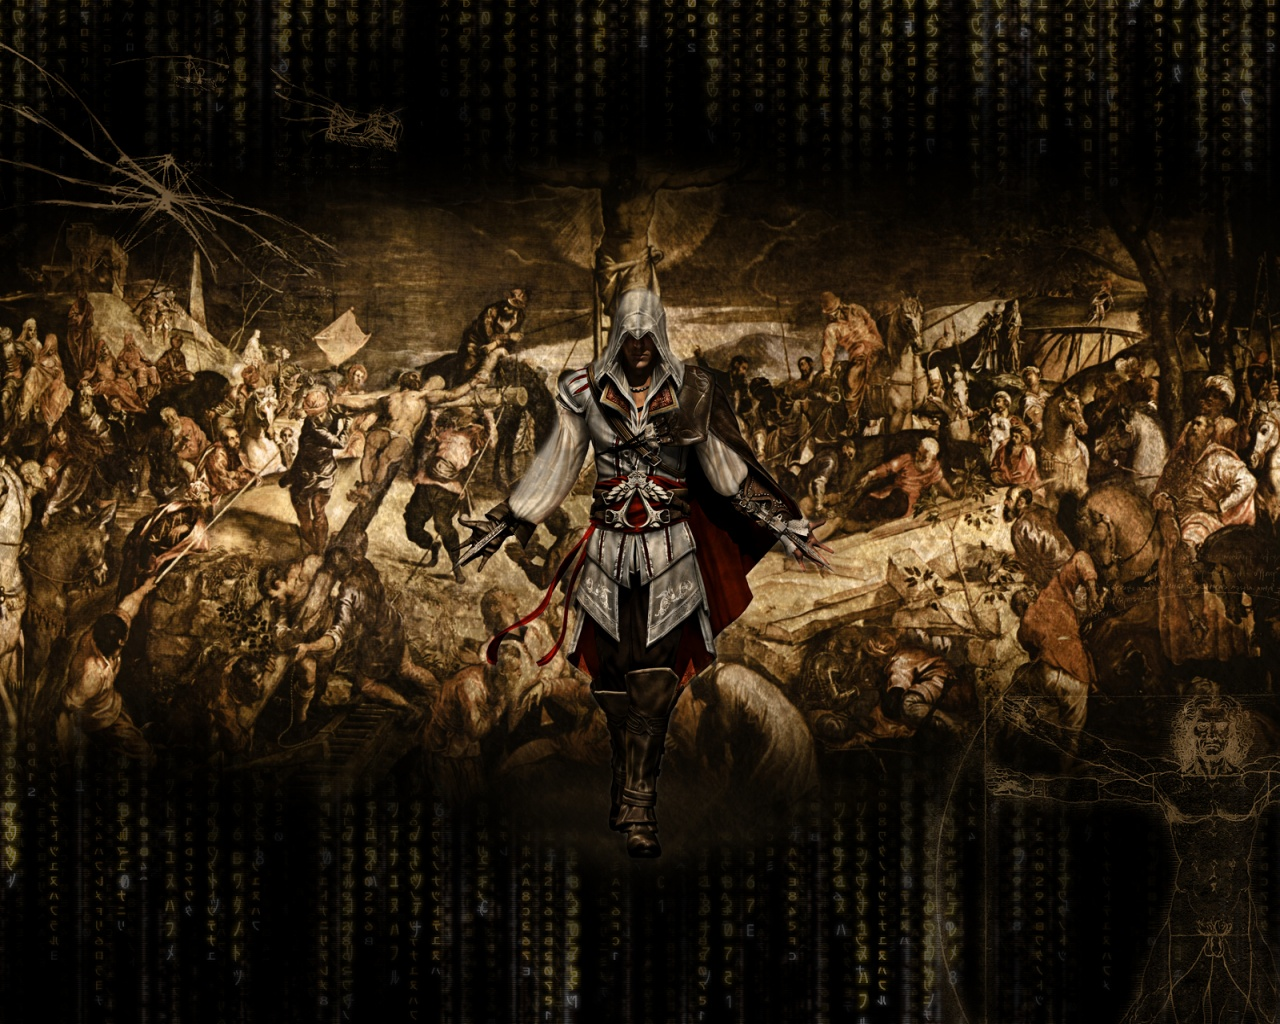 Assassin's Creed 2 Wallpaper 1280x1024